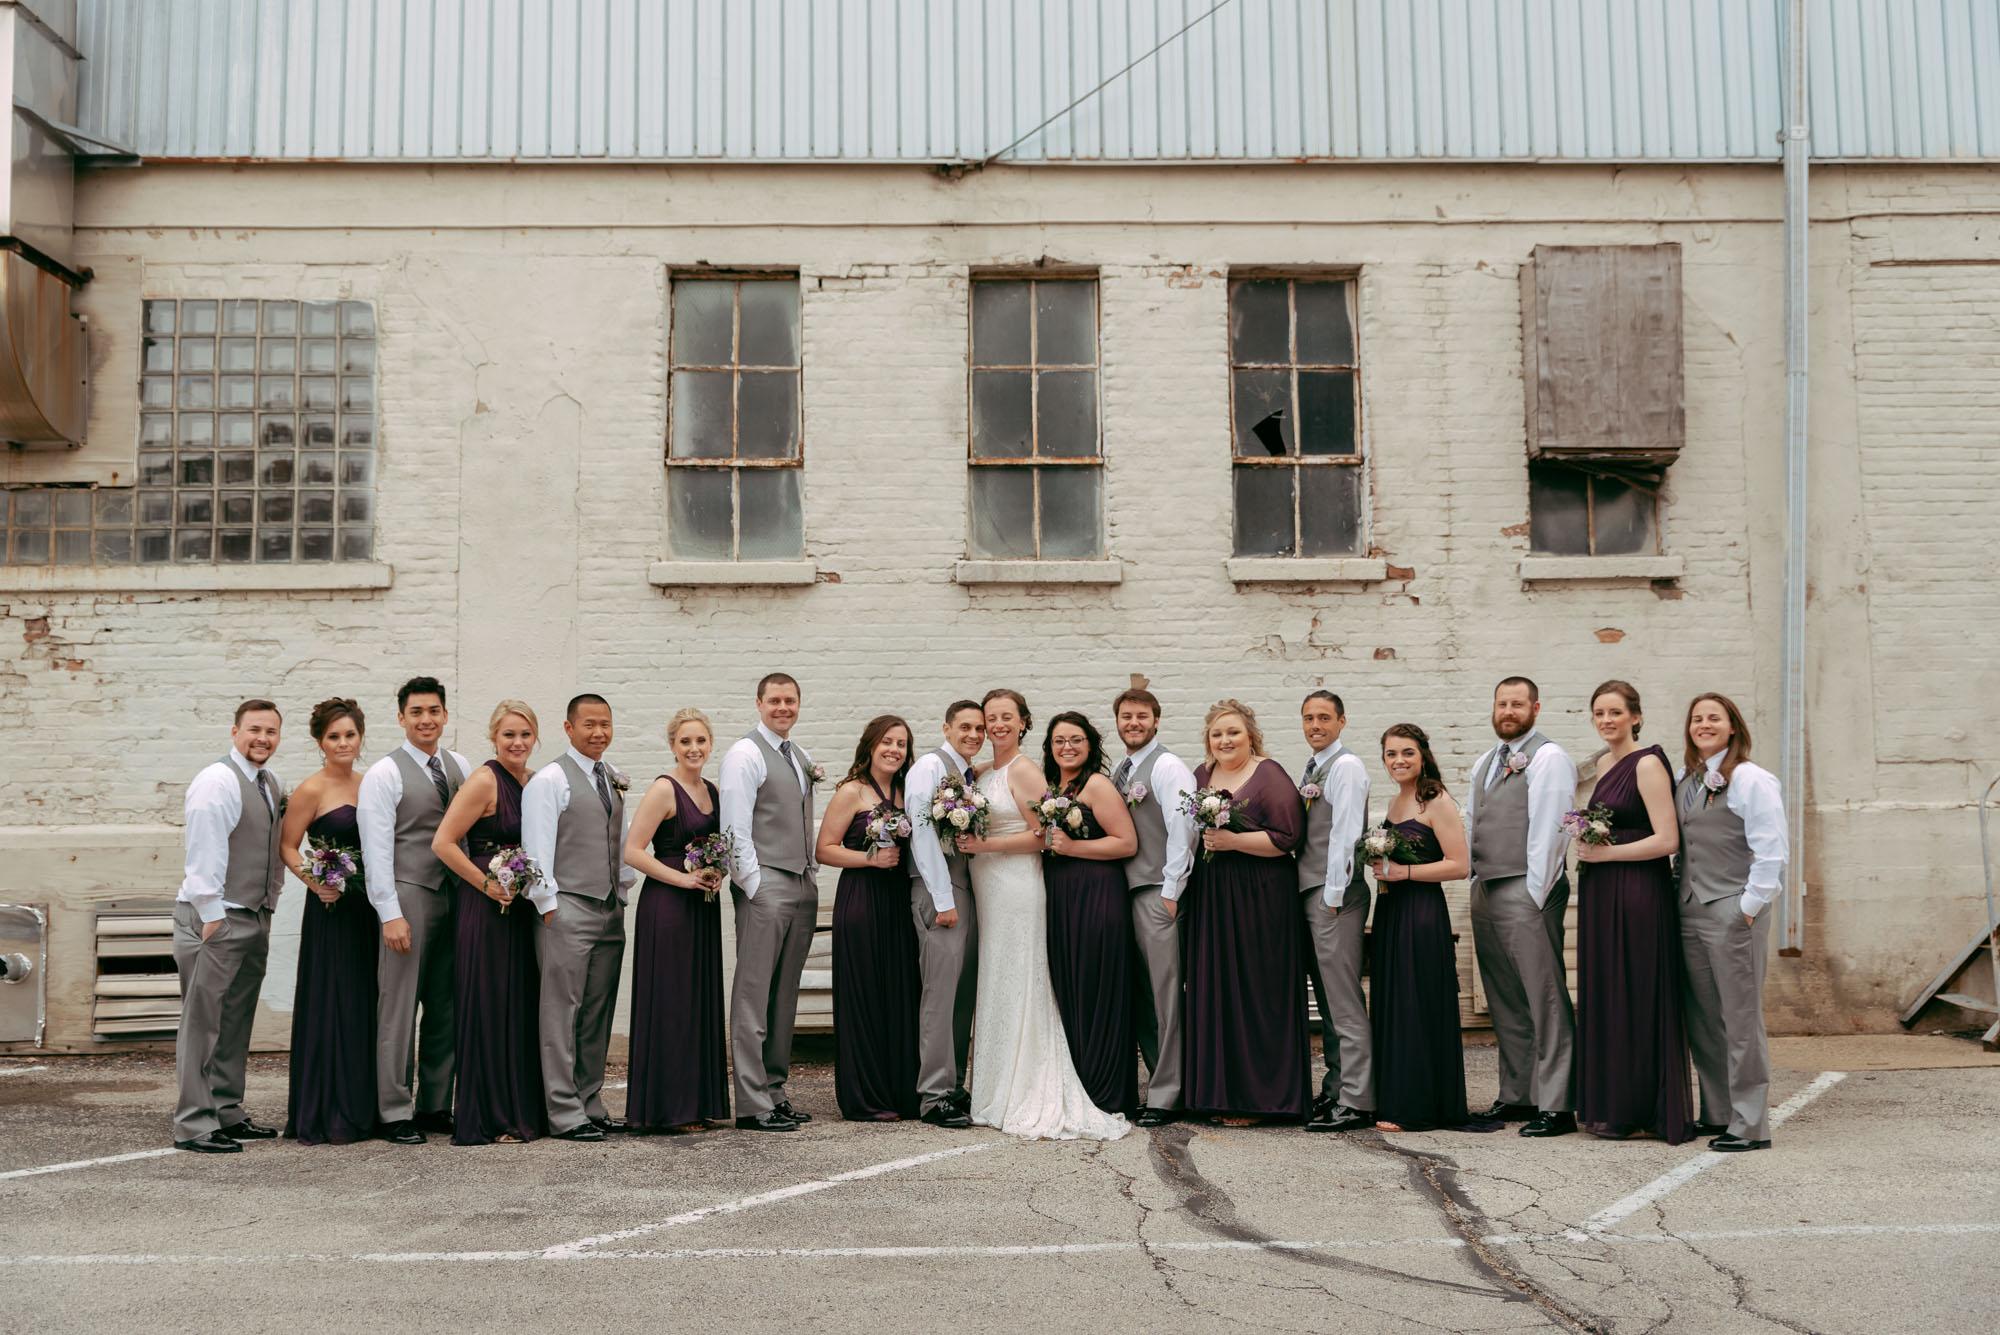 prairie-street-brewhouse-wedding-Rockford-IL-wedding-photographers-224.jpg